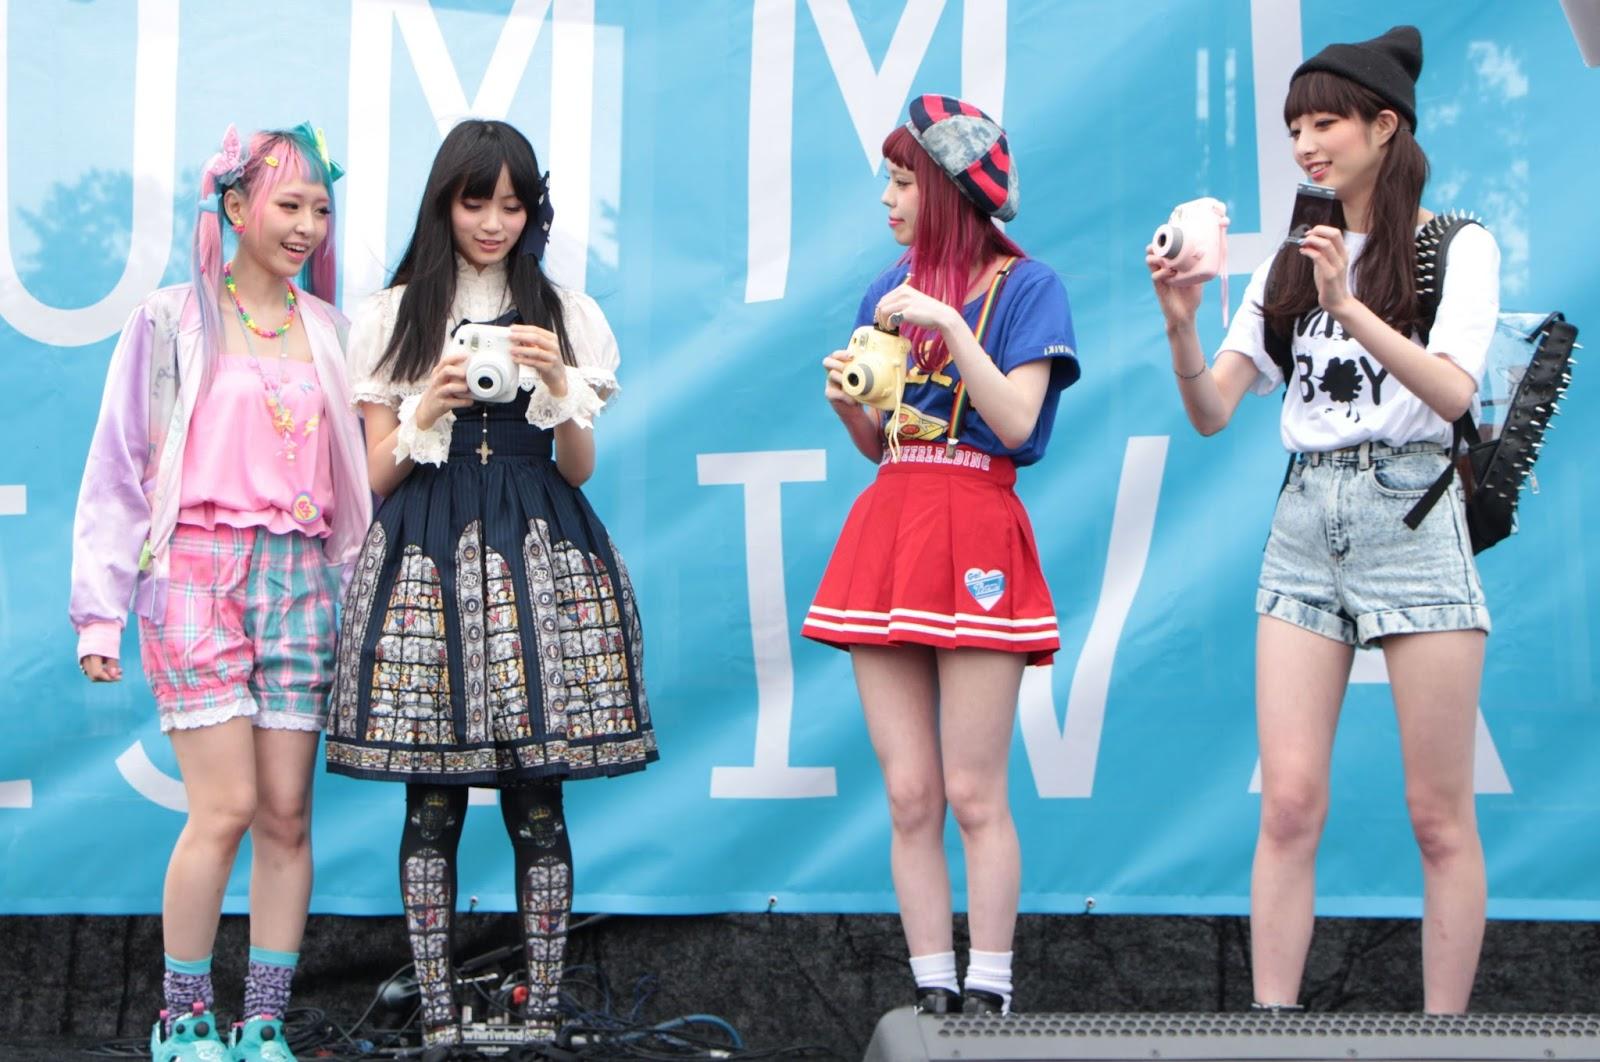 j pop summit, san francisco, harajuku fashion, japan, japanese, ayumi seto, eva, yura, saki sato, instax mini, fashion show